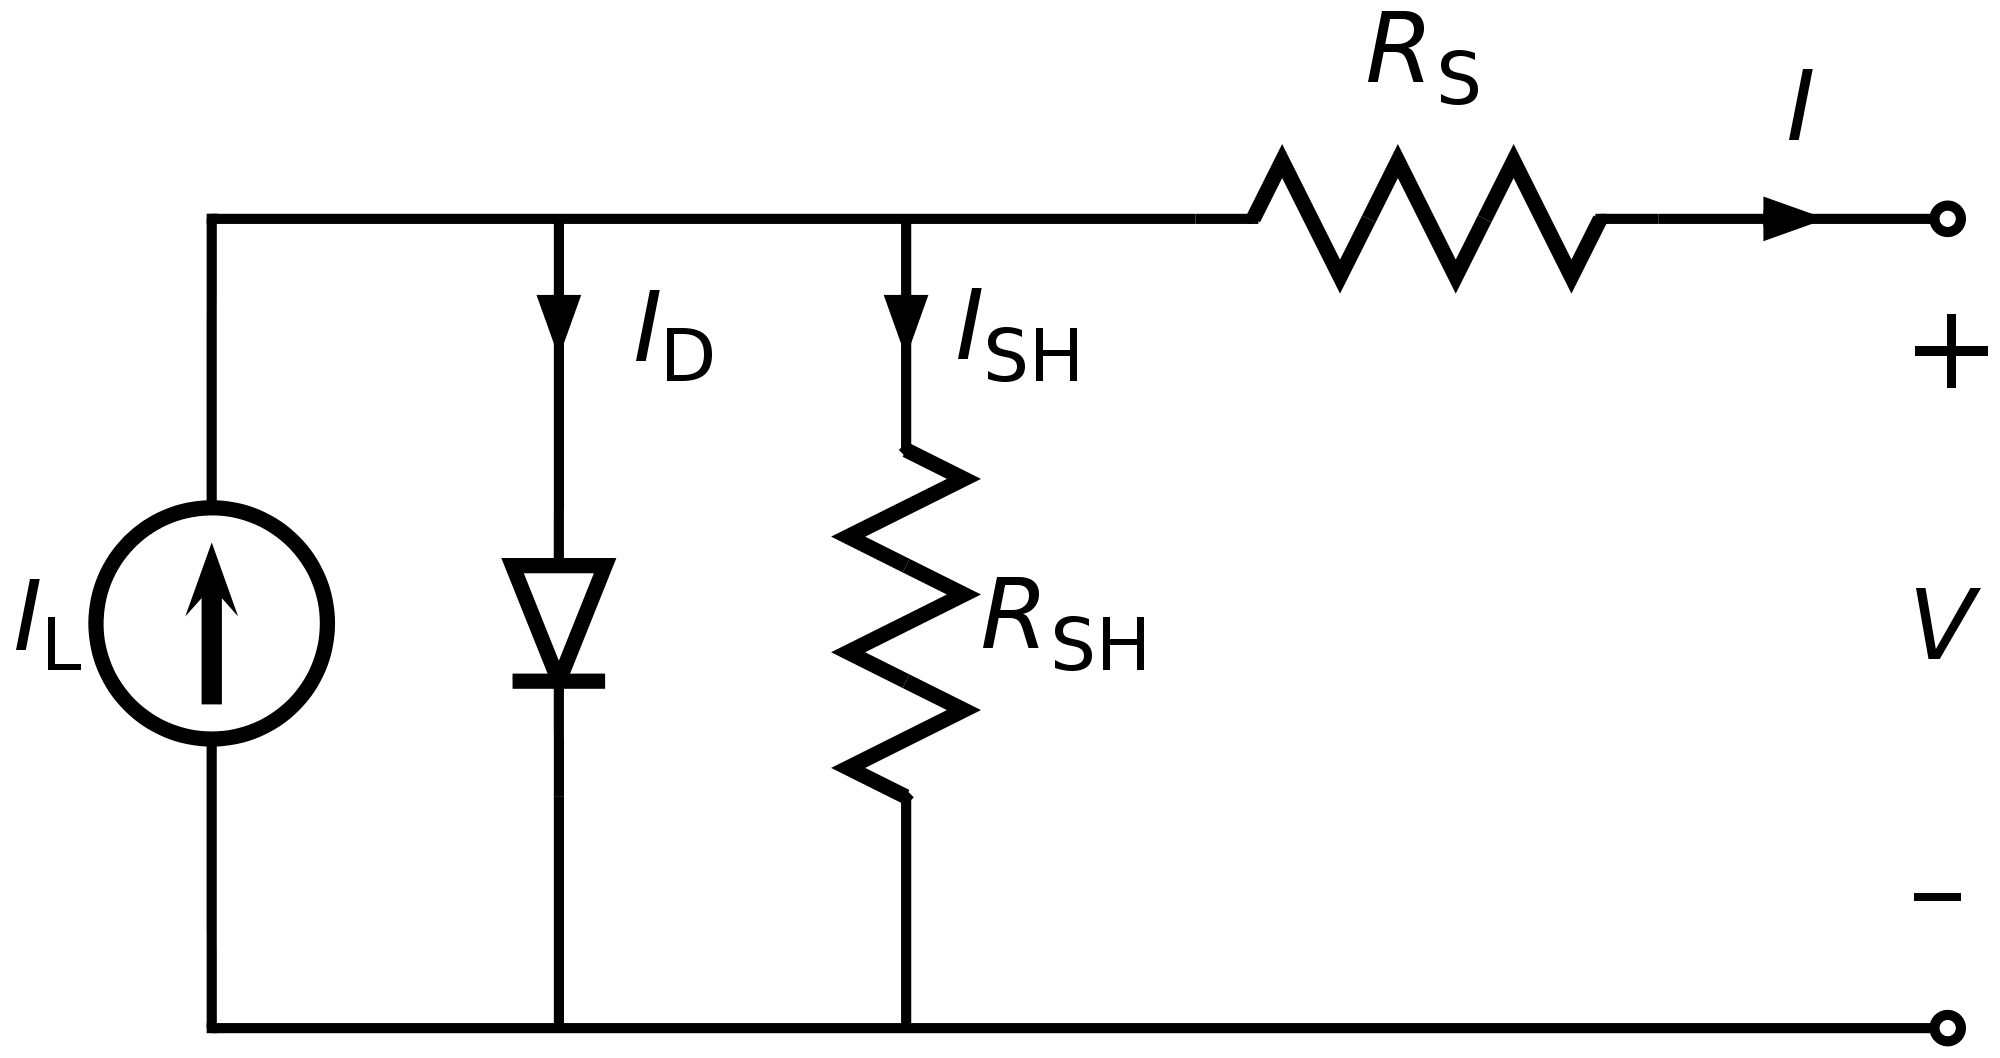 battery schematic symbol